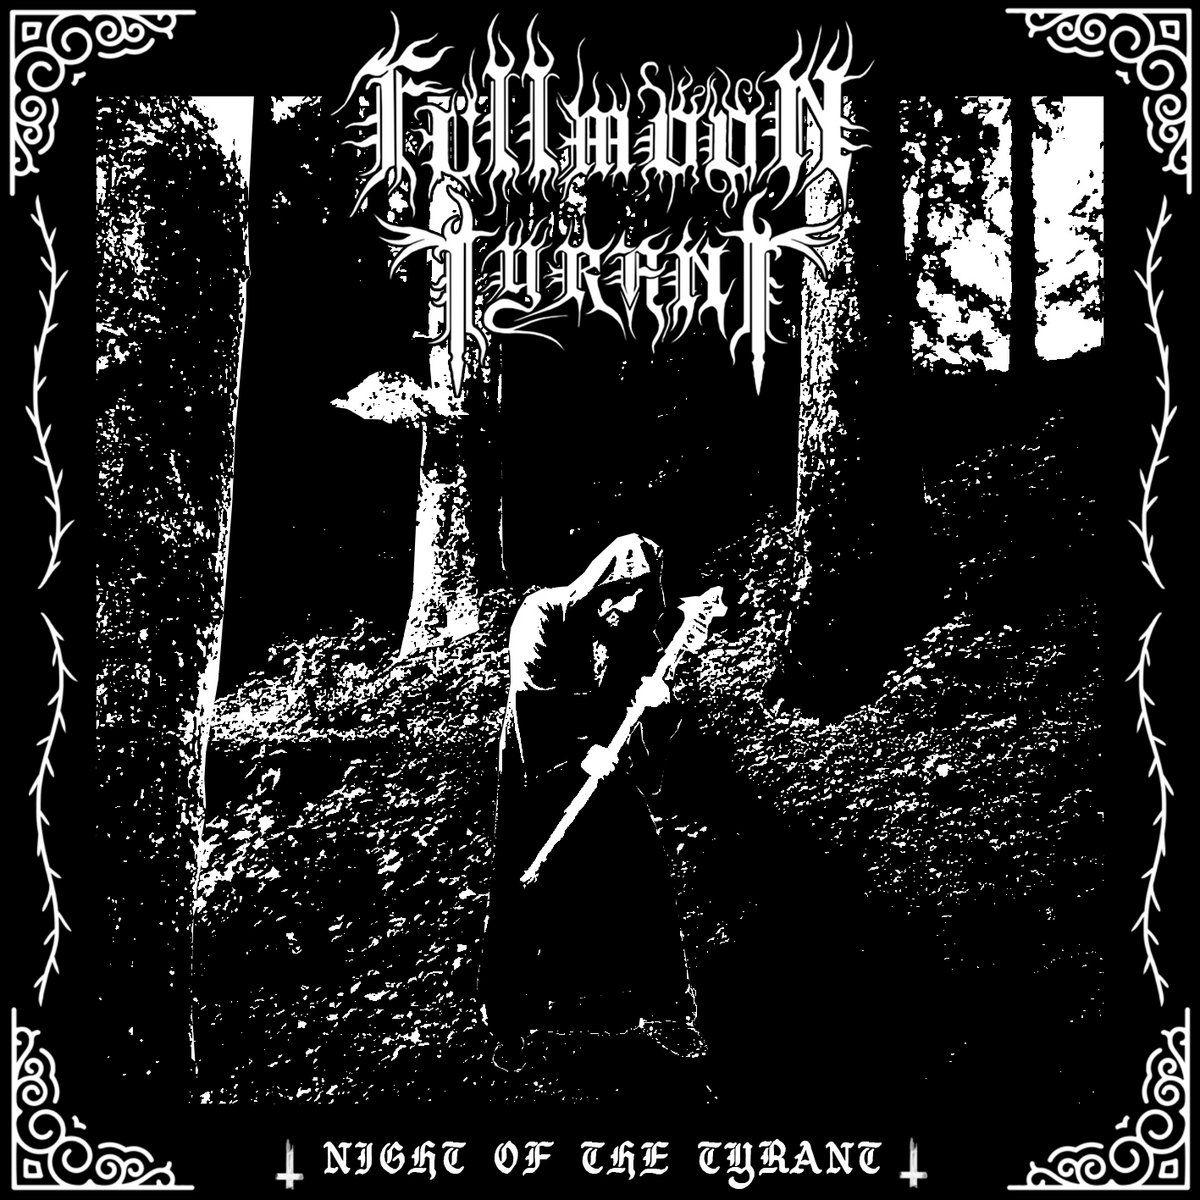 Fullmoon Tyrant - The Night of the Tyrant